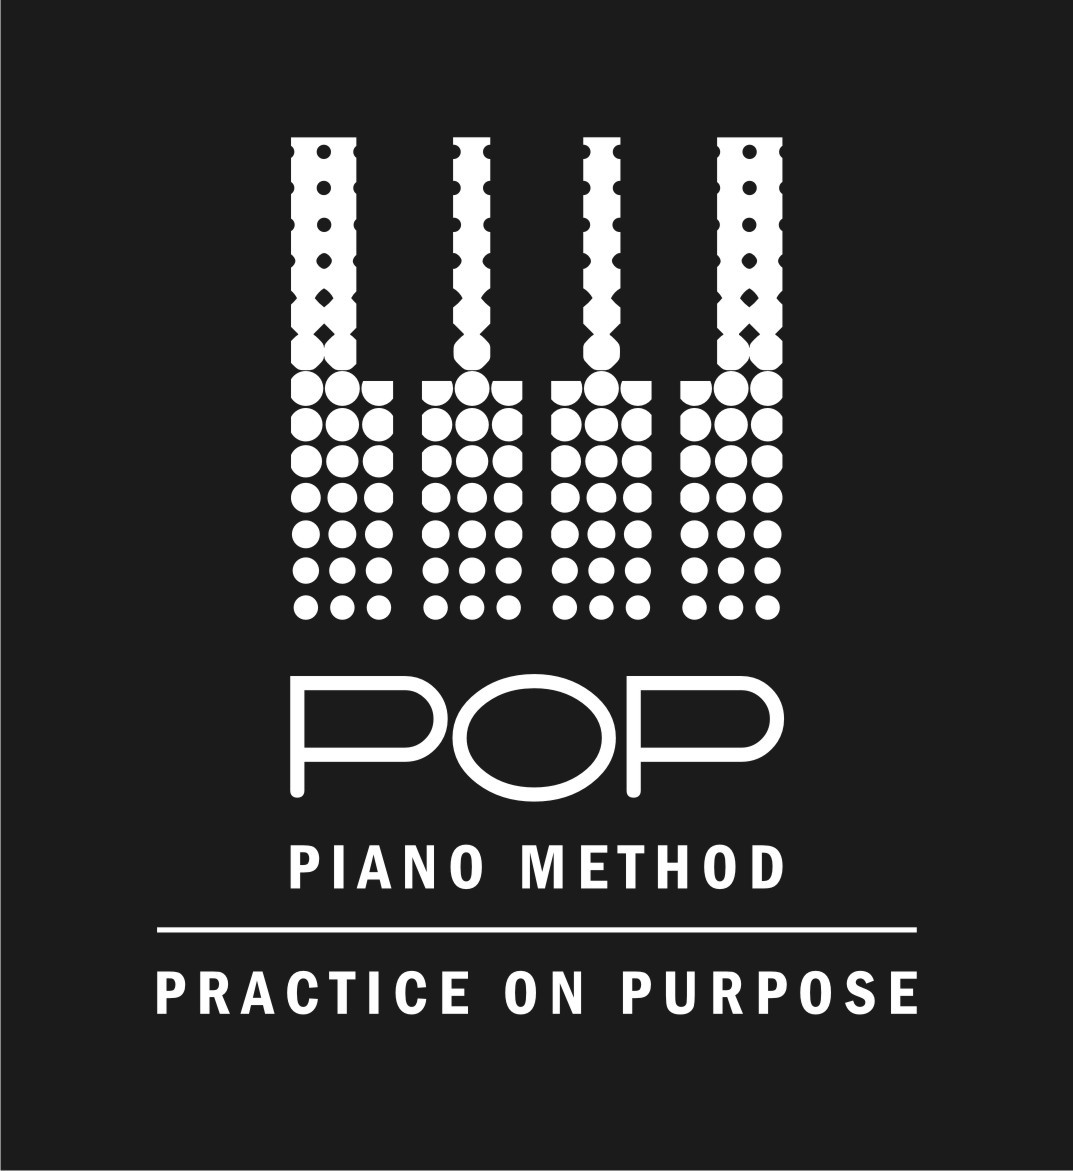 Creative, swaky design for a POP Piano Method